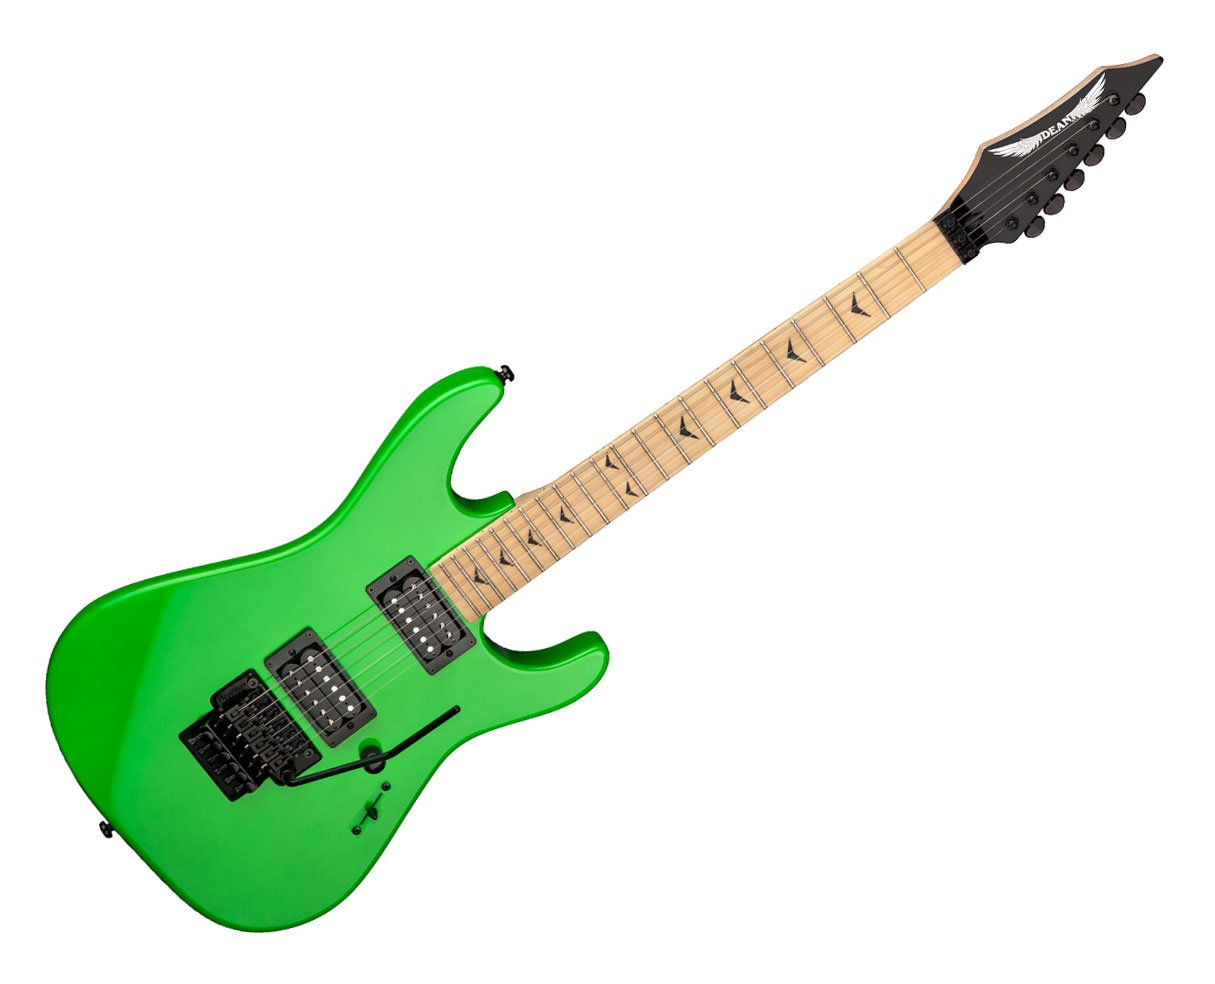 Cheap Dean Guitars Custom Zone II Floyd 6-String Electric Guitar - Nuclear Green Black Friday & Cyber Monday 2019